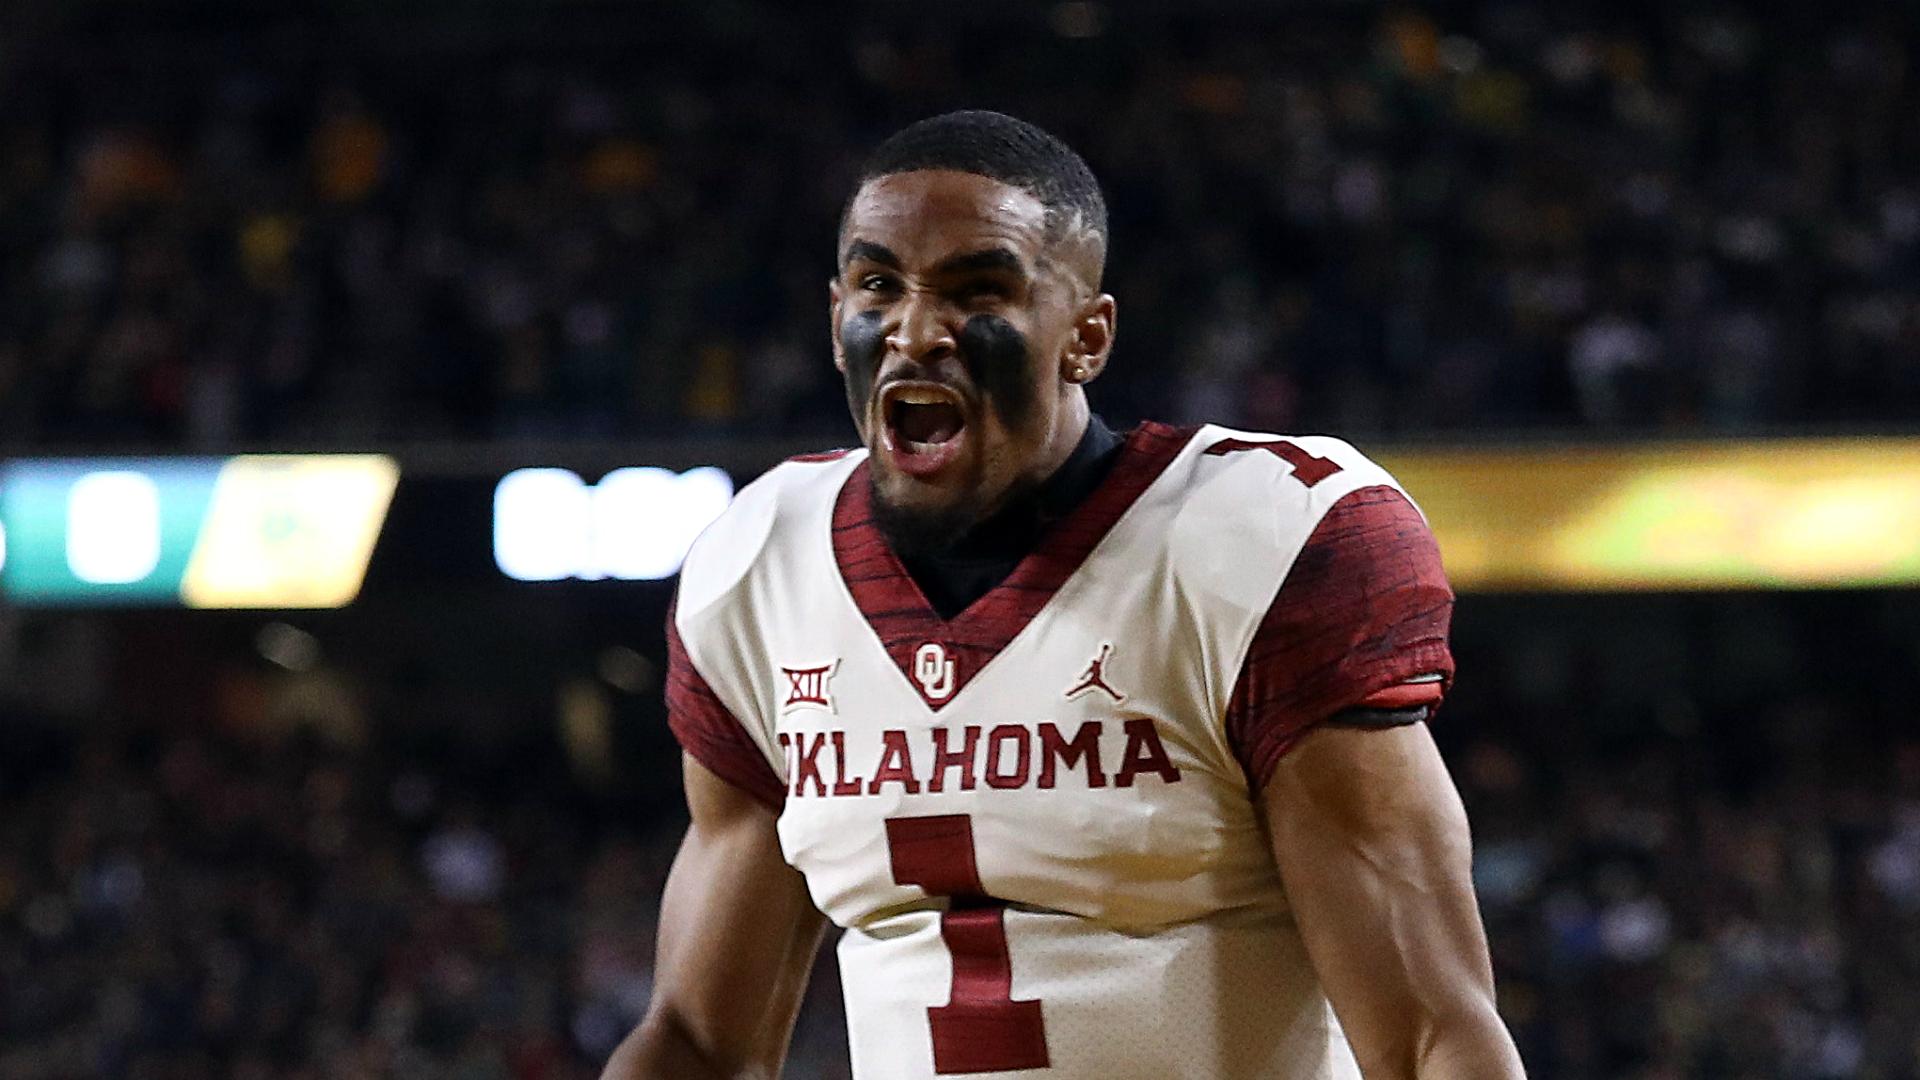 Oklahoma didn't falter as Jalen Hurts, Sooners defense led ...